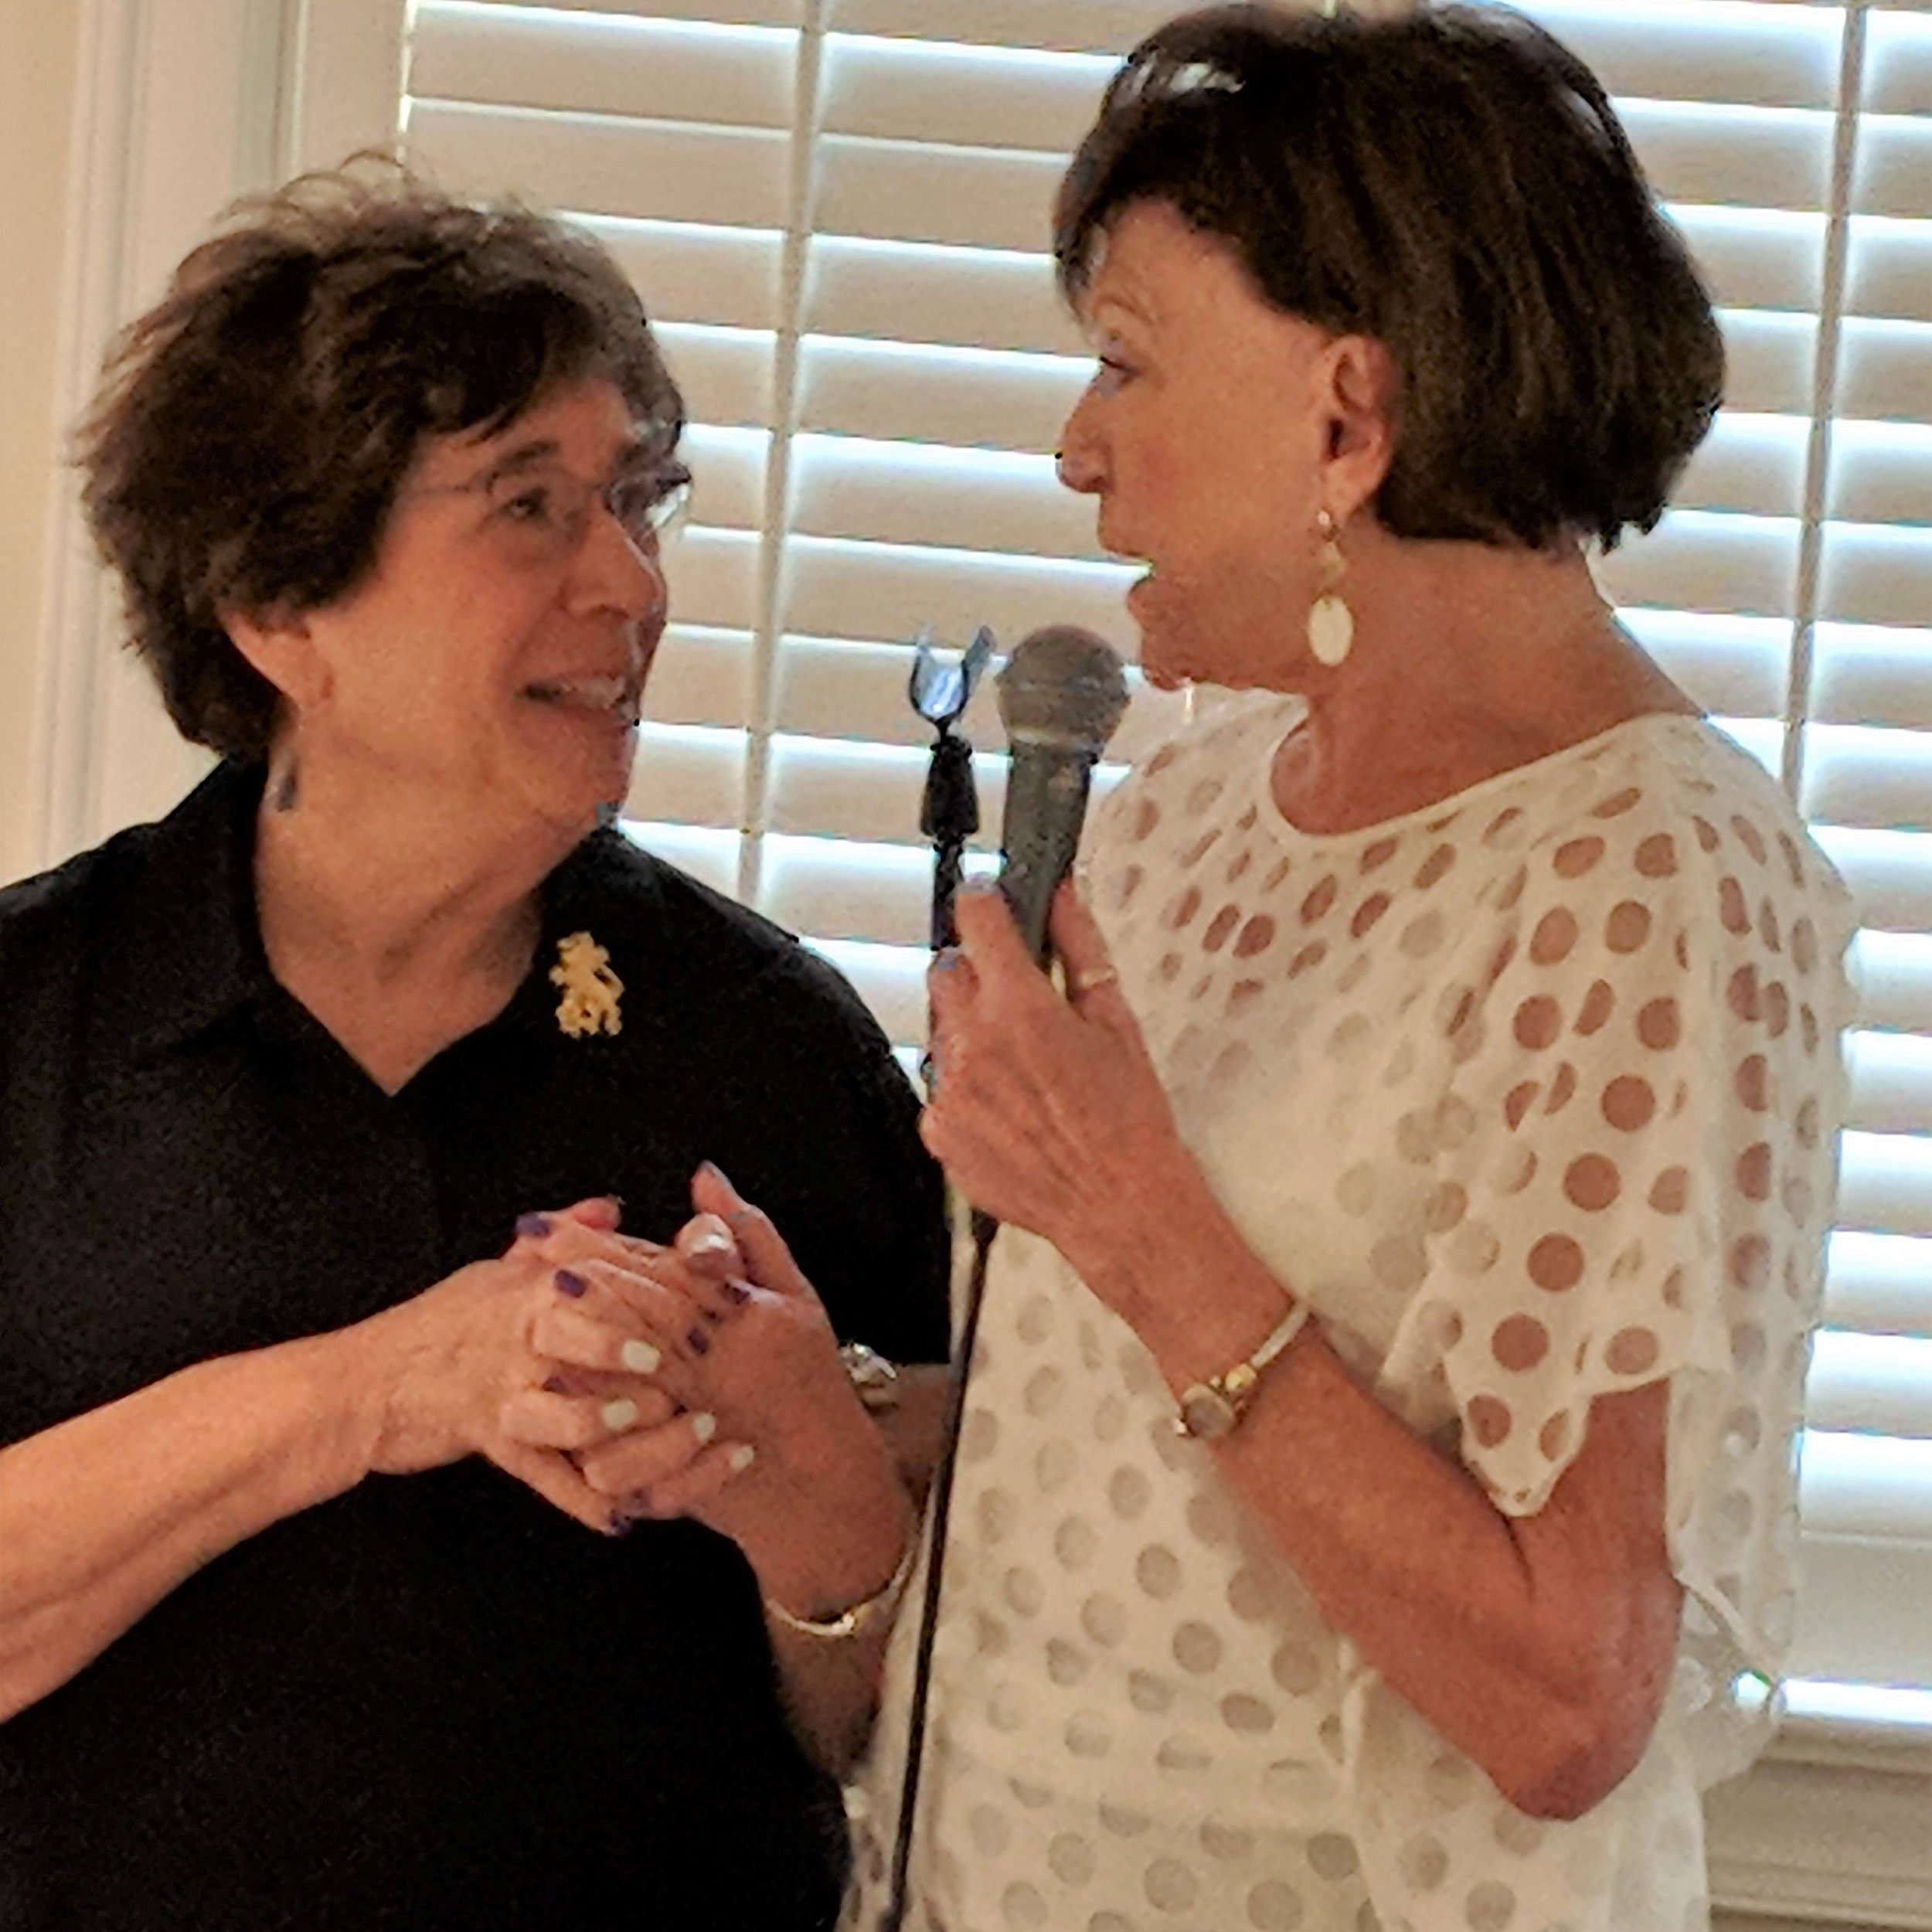 Claidia Kadis & Carole Guld at the LOJ luncheon at the Gregg Museum